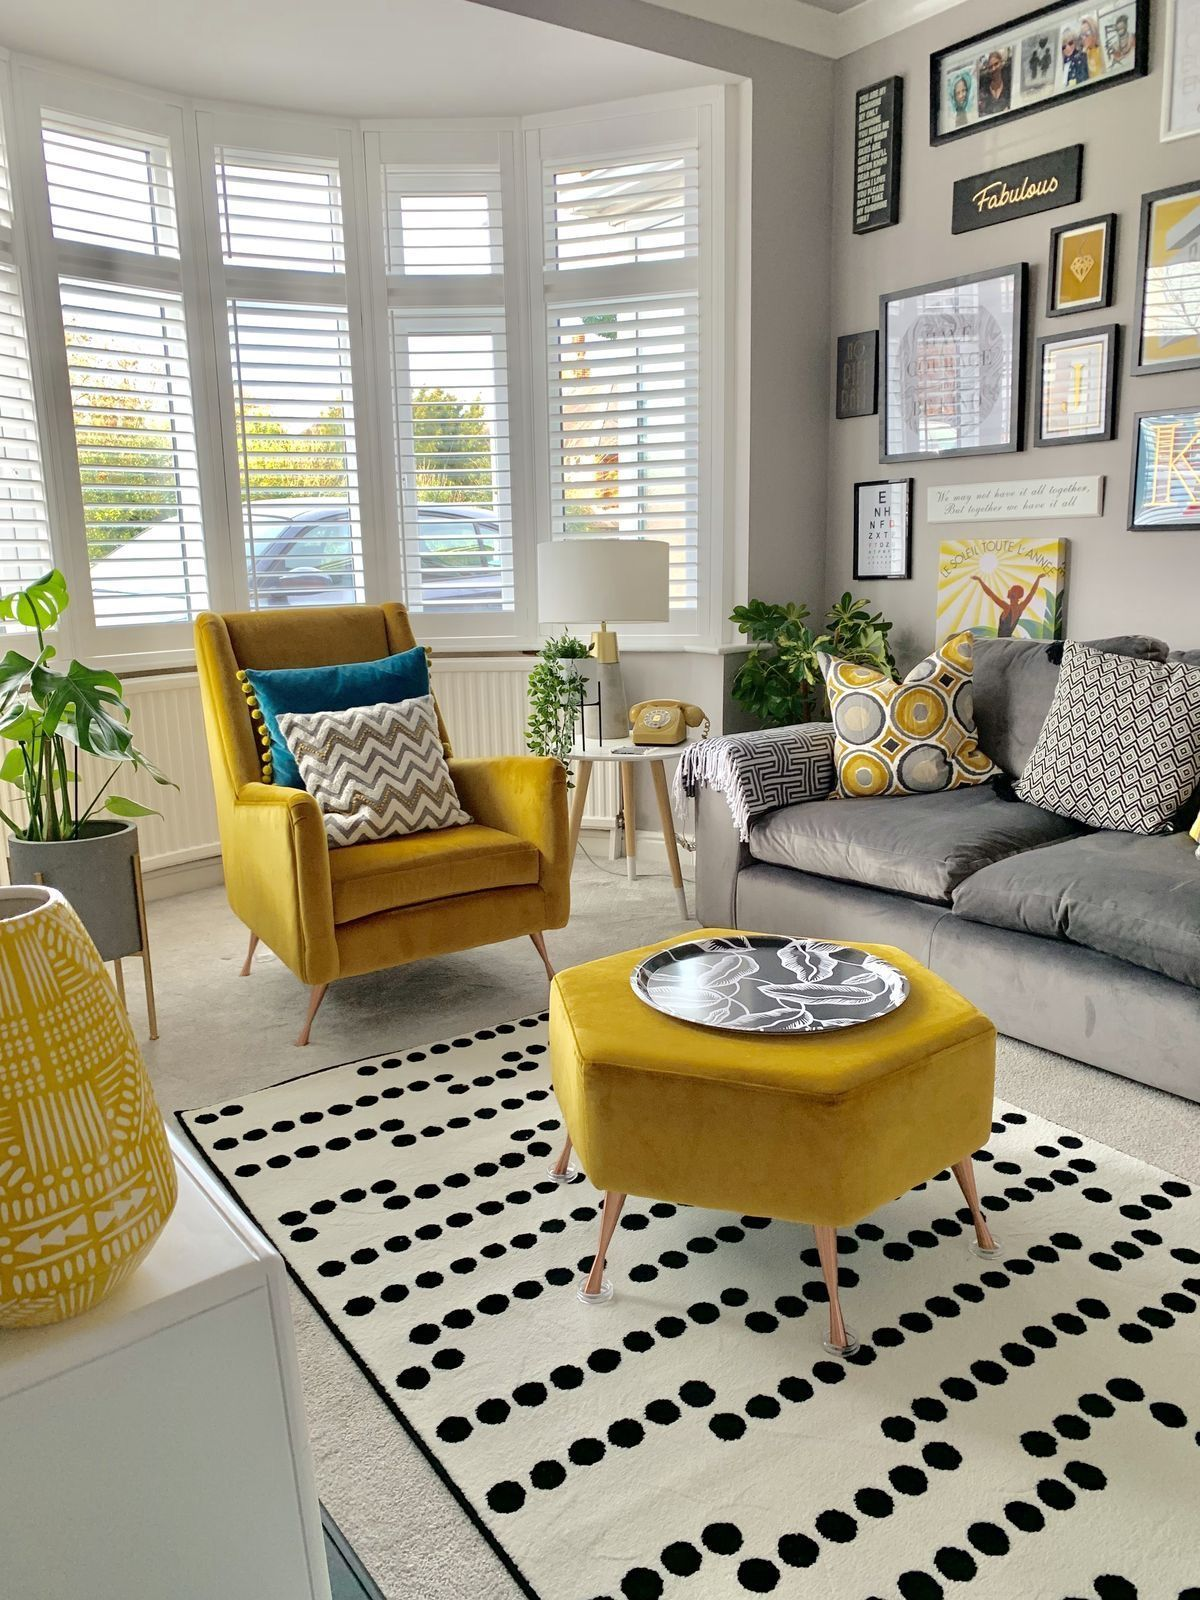 Lounge Decor Sitting Room Ideas Interior Design Great